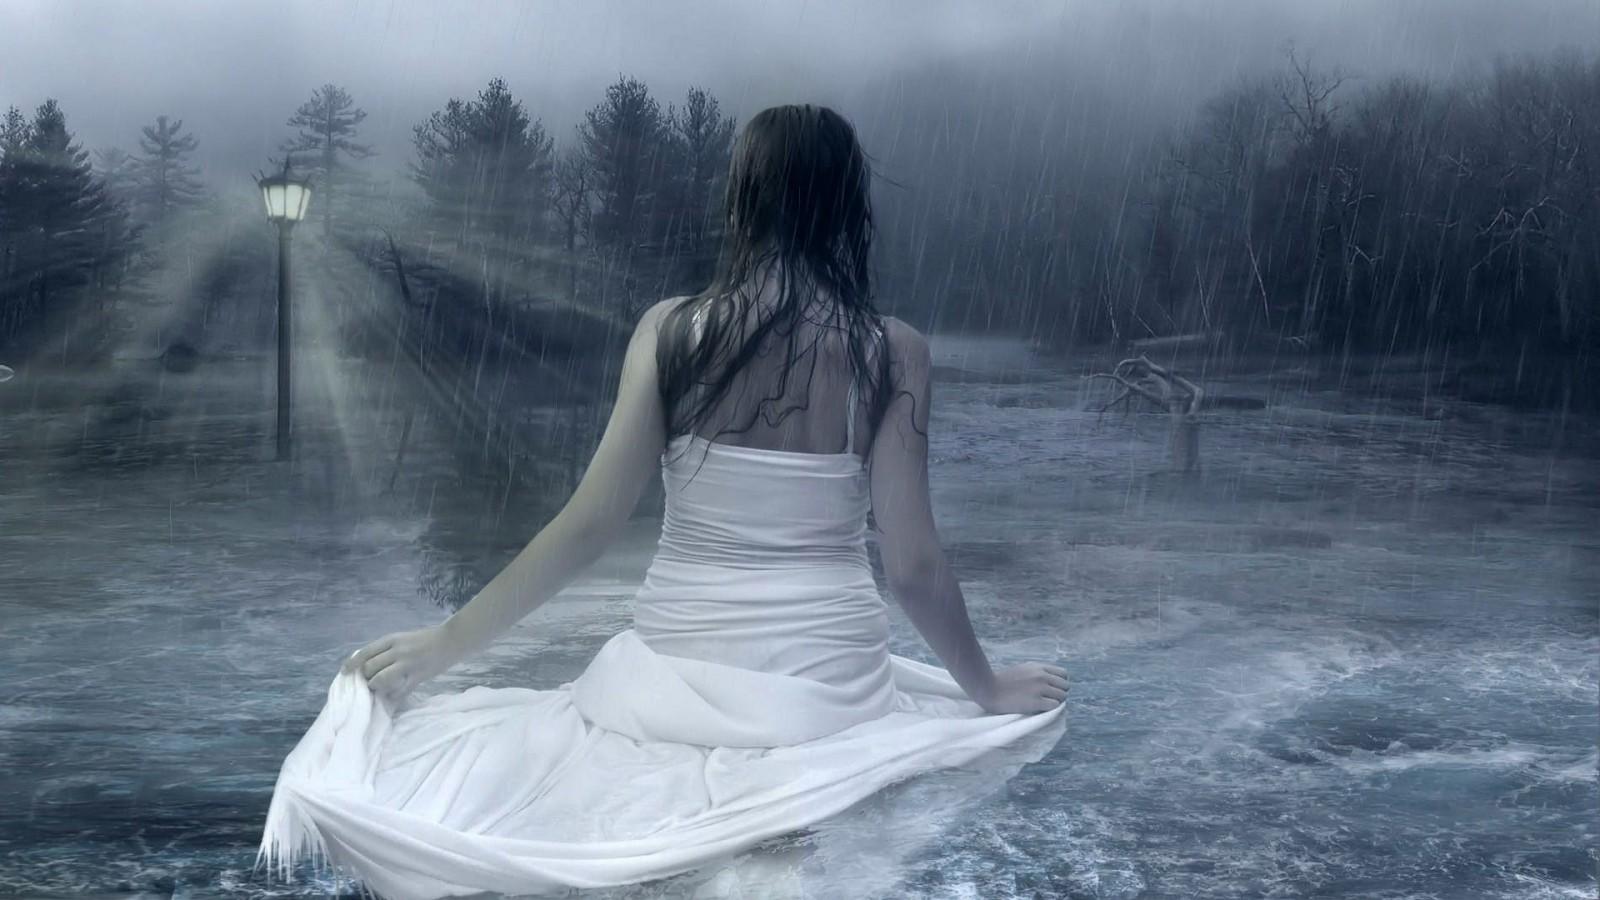 http://1.bp.blogspot.com/-MY9BhVZ1KyI/TxDBMbYLdrI/AAAAAAAADIw/-5OwfdE2y8c/s1600/a-in-rain-wallpapers.1600x900.jpg